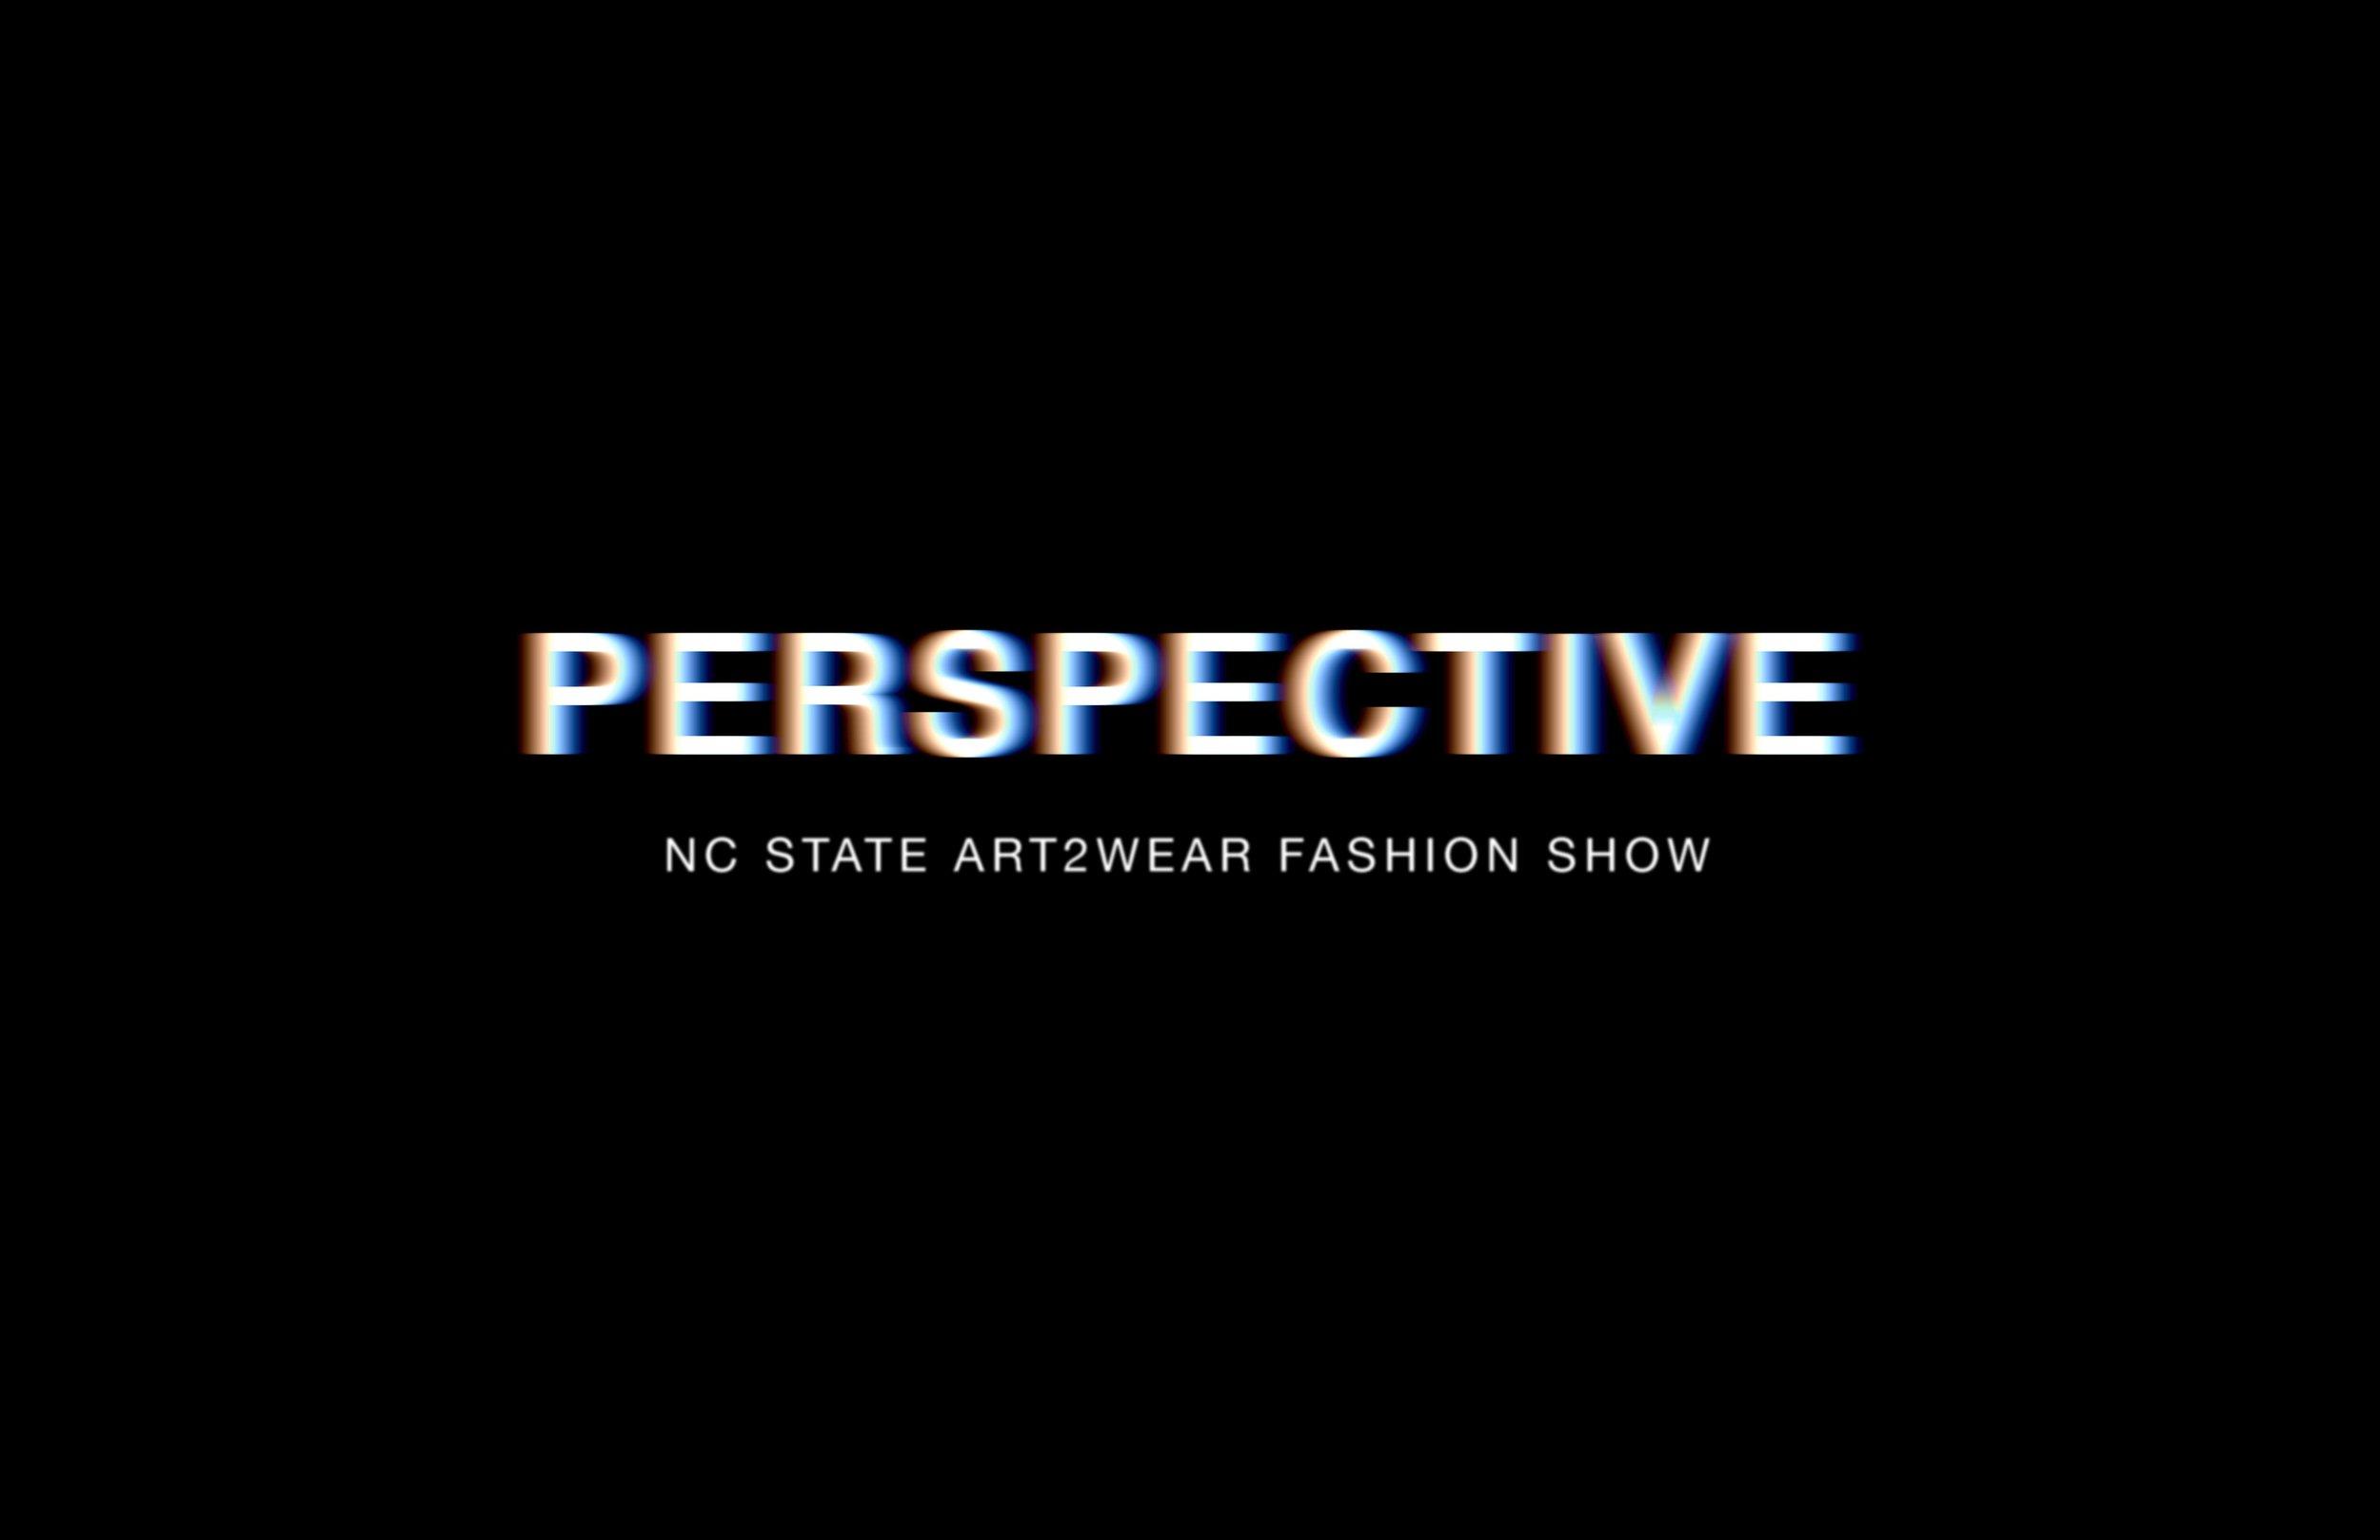 pespective-01.jpg